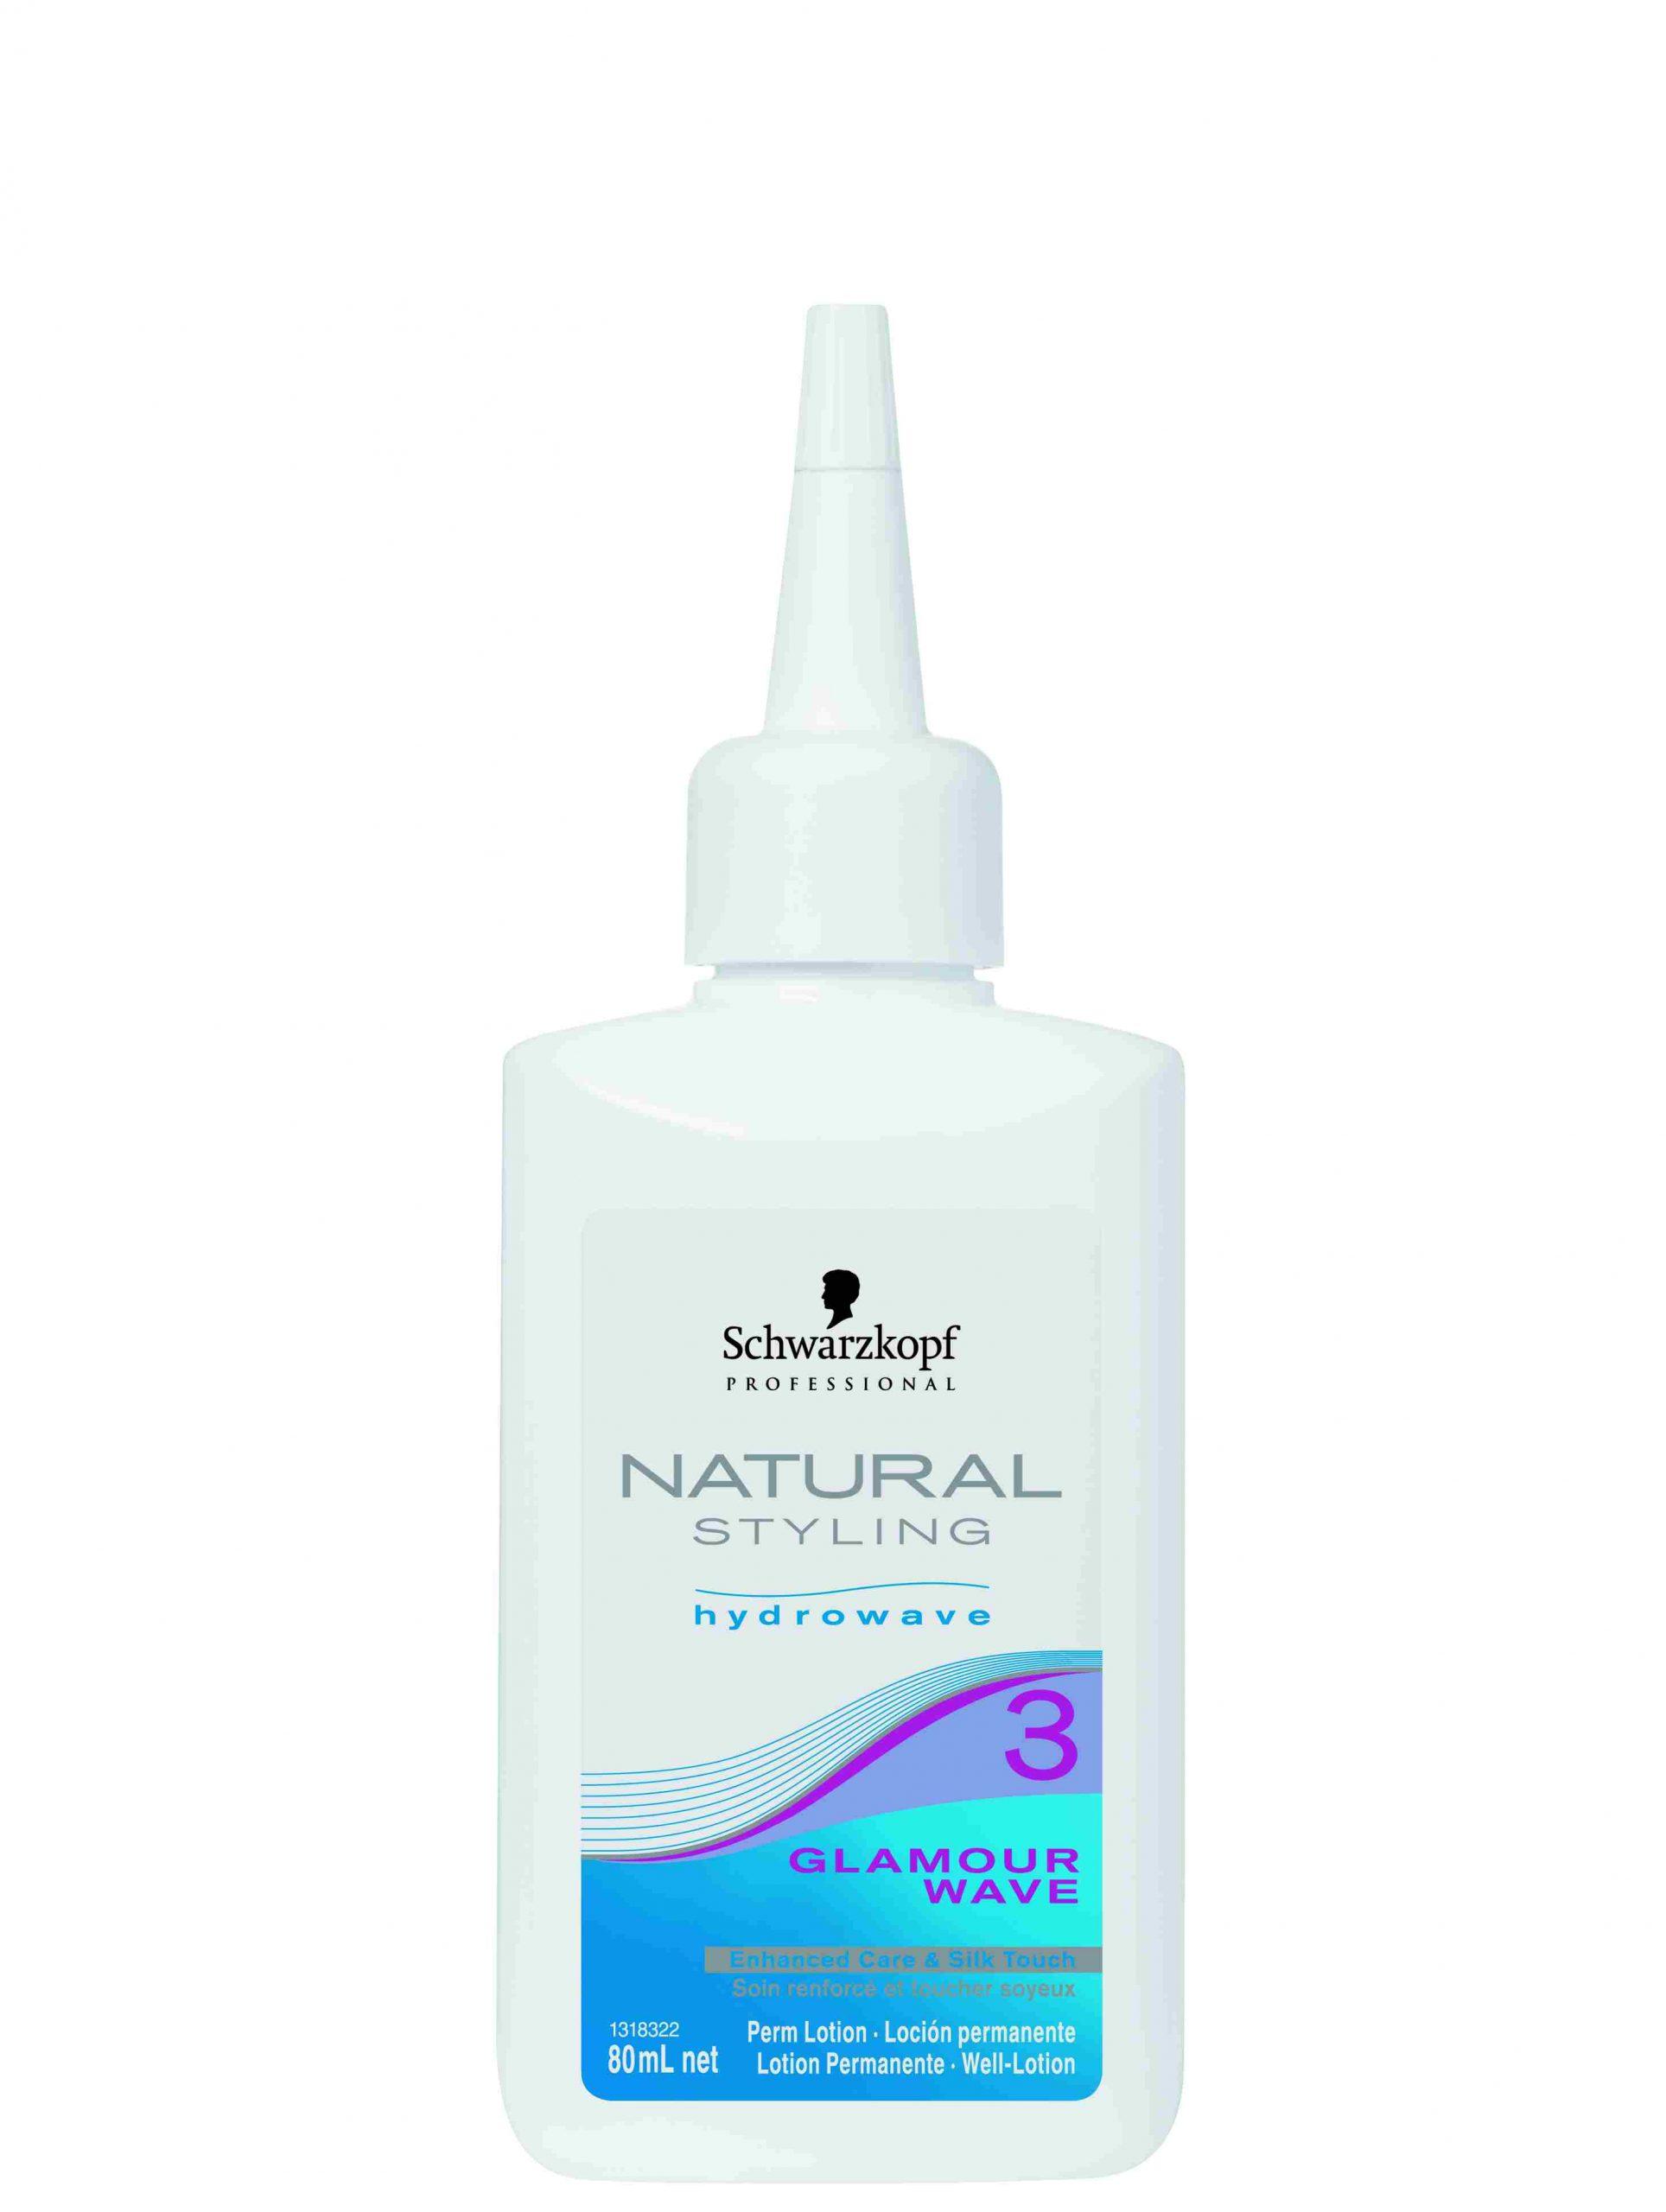 Schwarzkopf Professional Natural Styling Hydrowave Glamour Wave Perm Lotion Permanentvloeistof 3 80ml